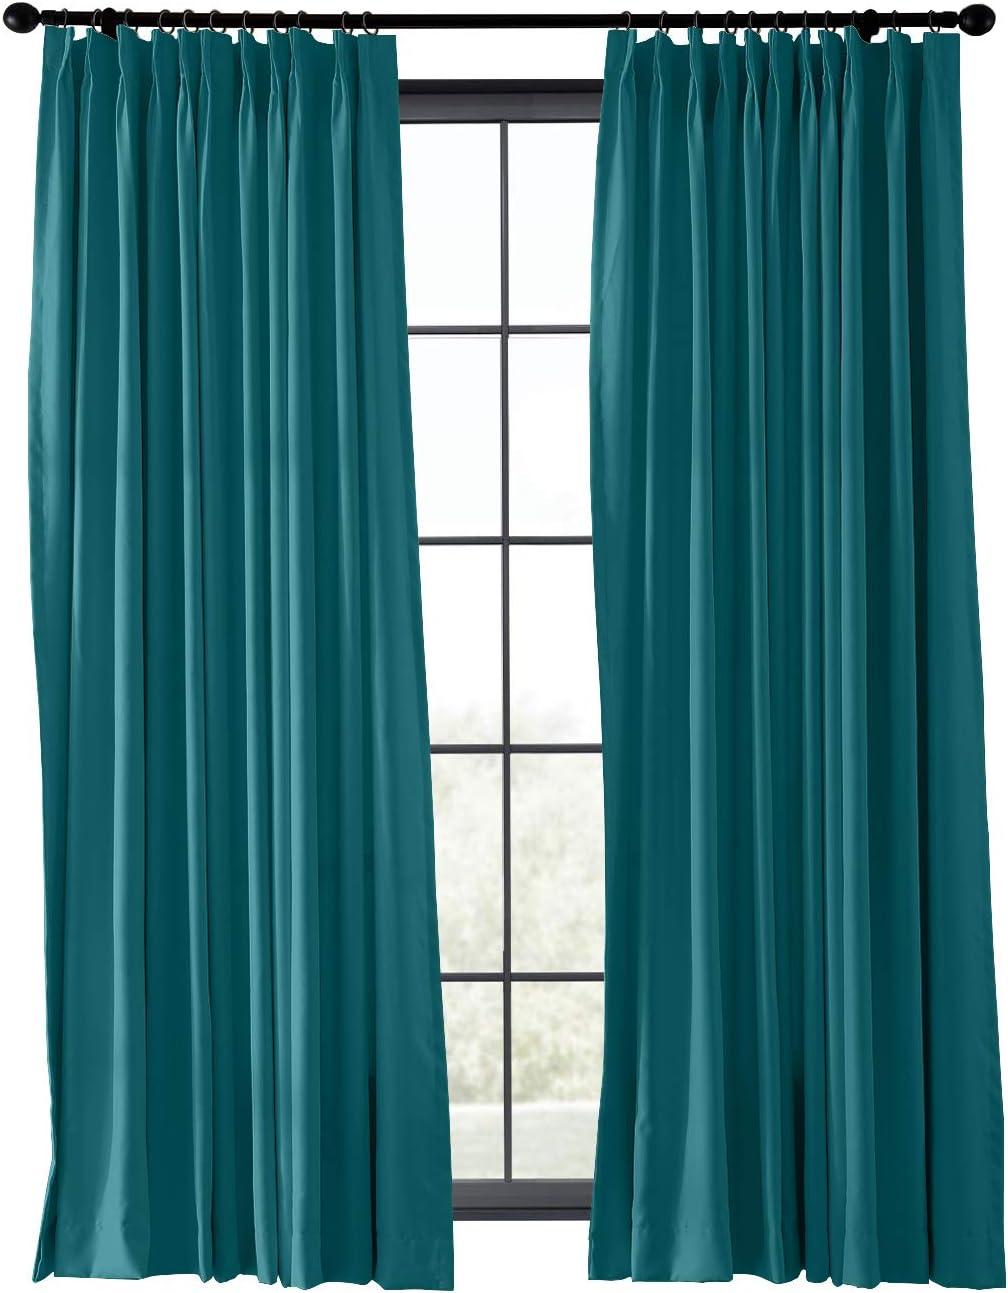 online shop ChadMade Flame Retardant Curtain Antique Grommet S Eyelet Bronze 25% OFF